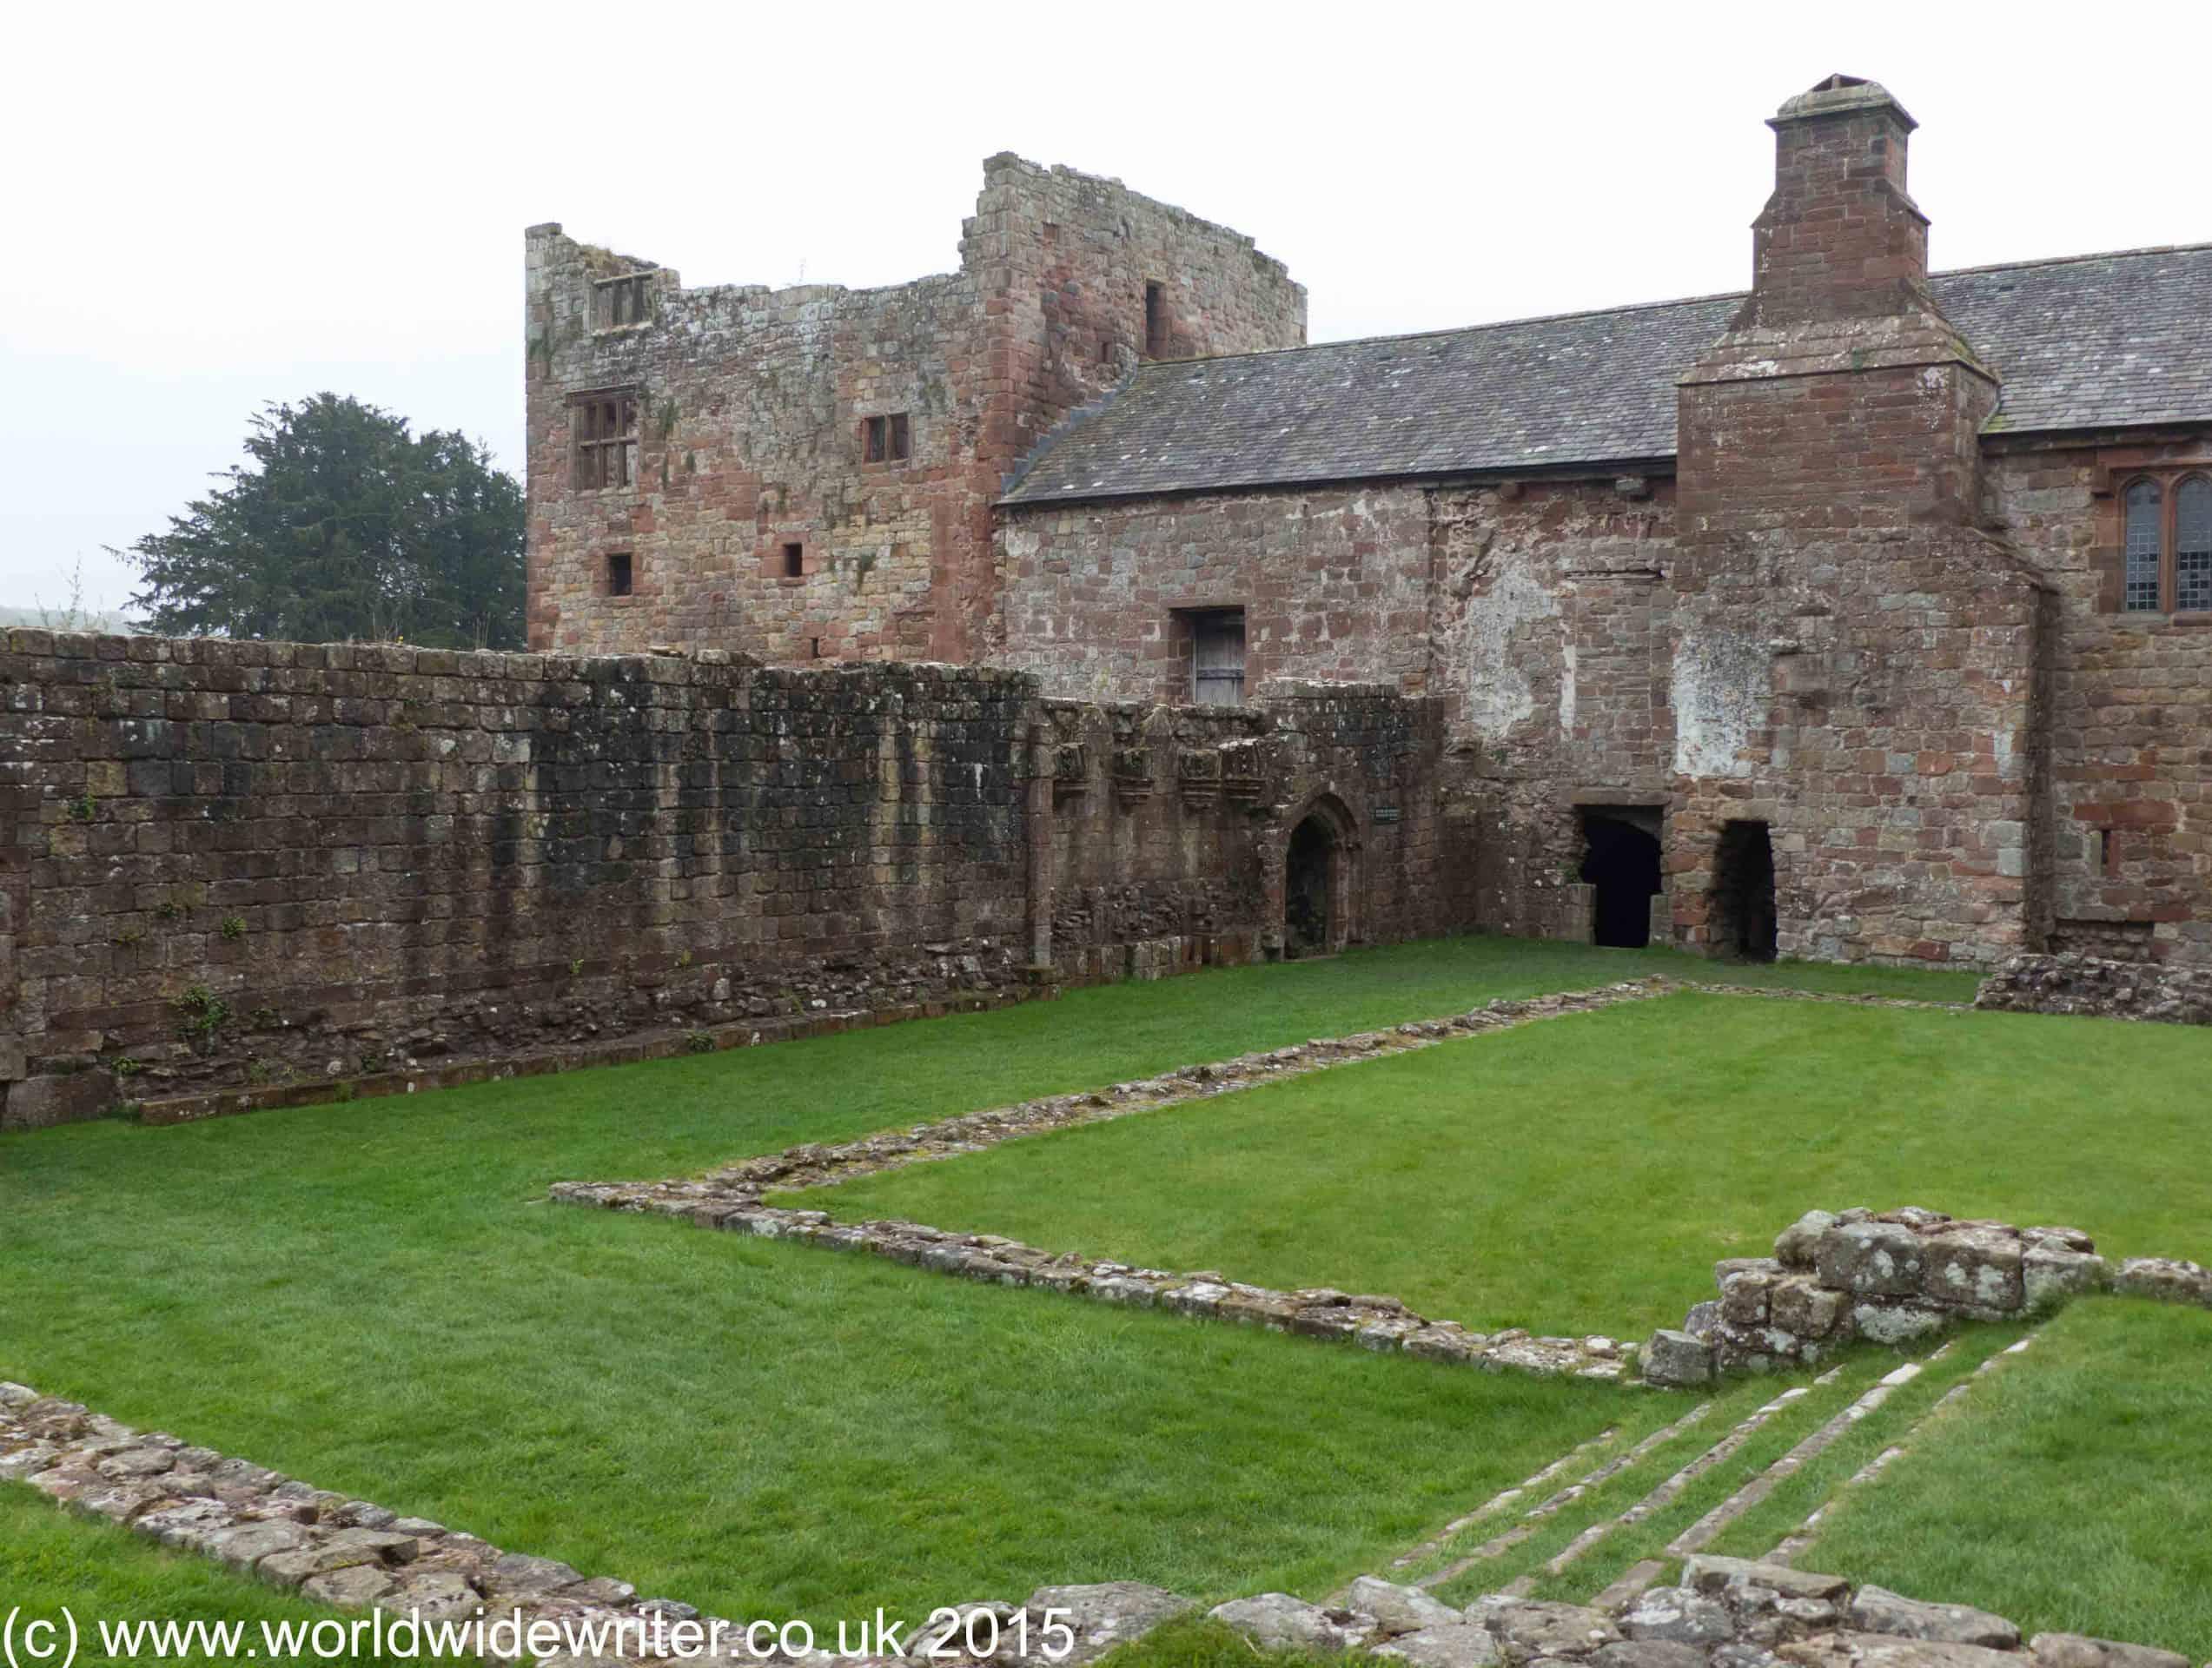 Cloister, Lanercost Priory, Northumberland - www.worldwidewriter.co.uk